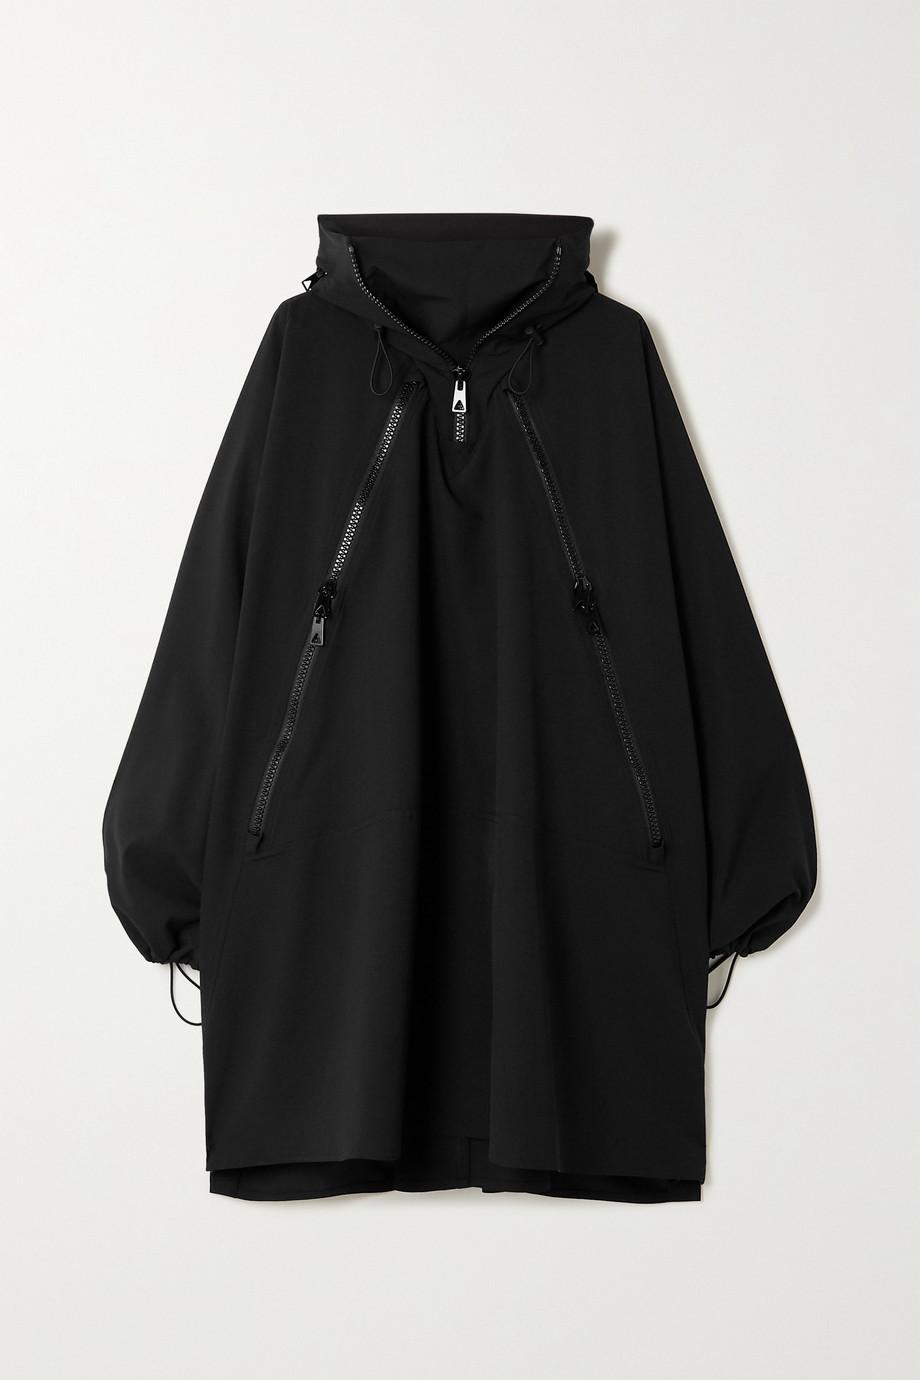 Bottega Veneta Oversized-Jacke aus Ripstop mit Kapuze